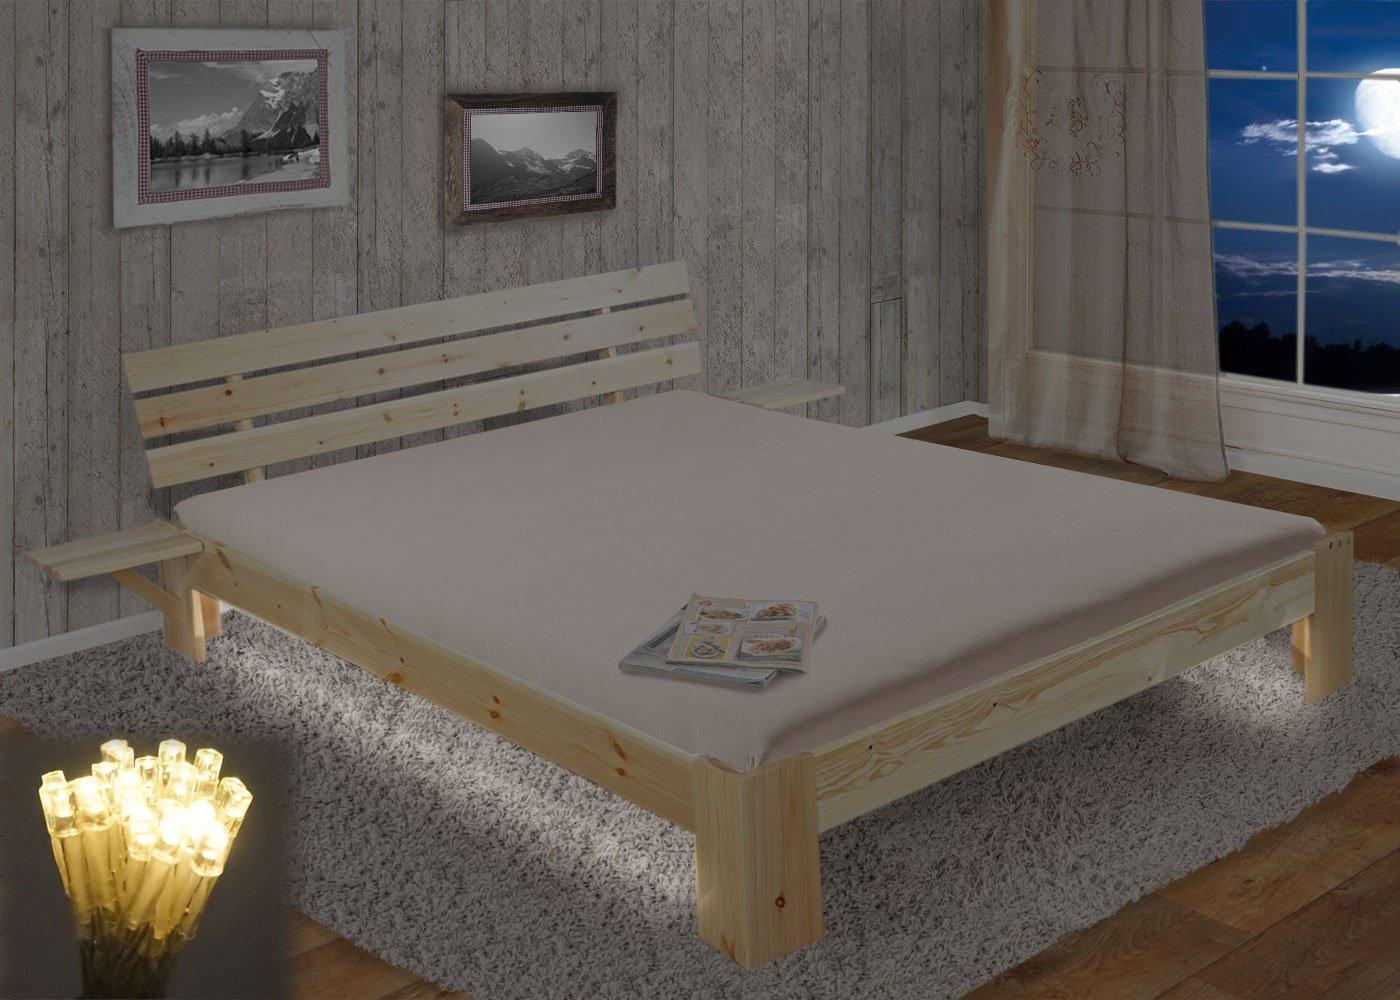 Bett Perth, Doppelbett, Massivholz incl. Lattenrost Ablage Kiefer ~ 180x200cm, natur lackiert, LED